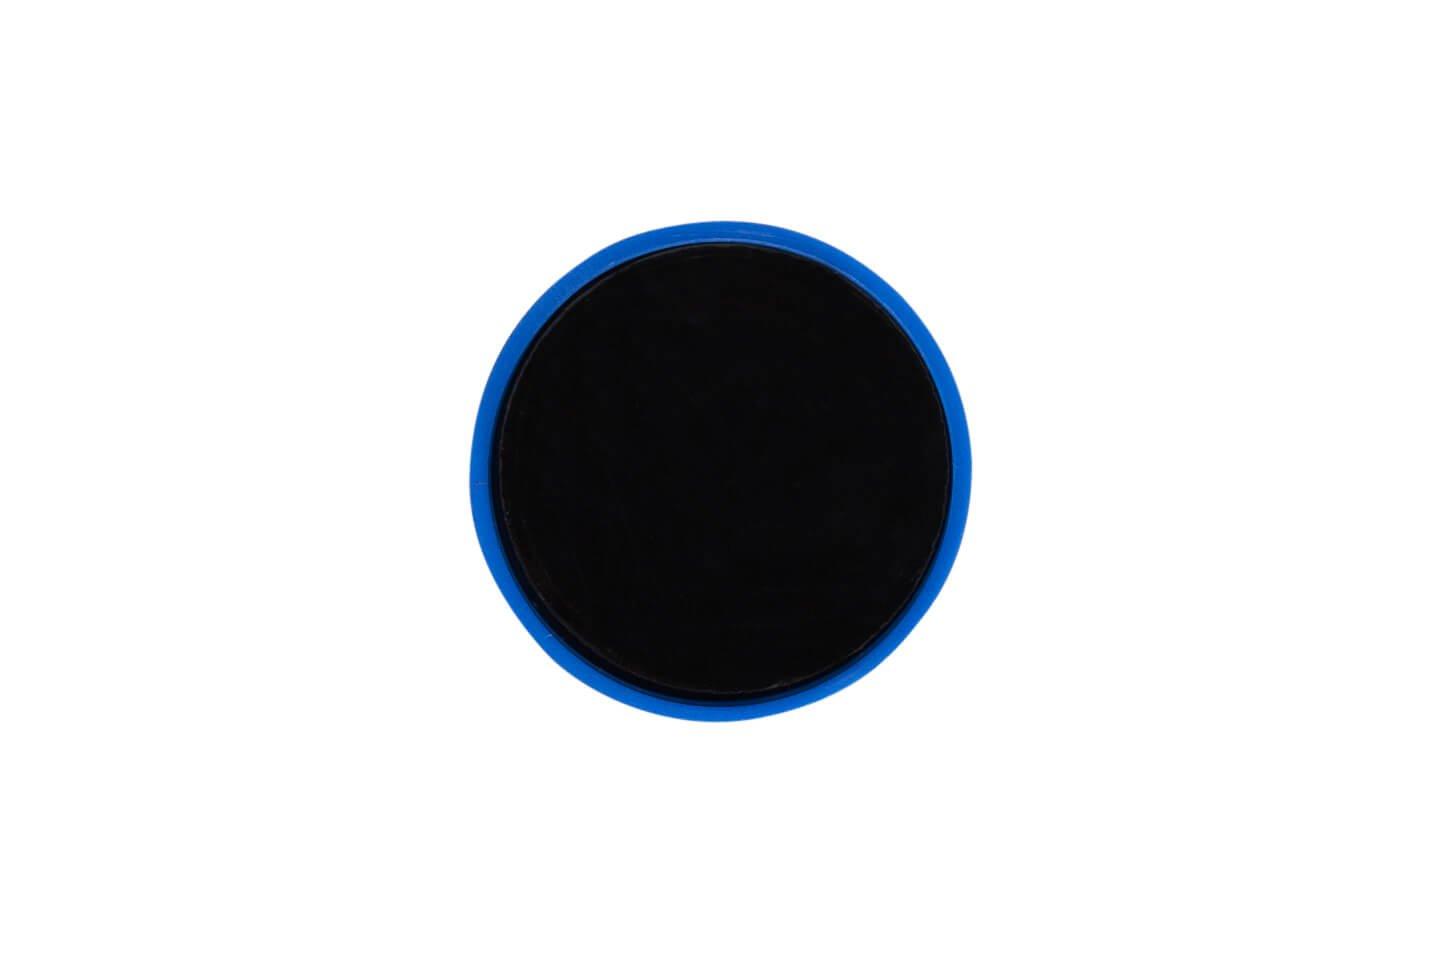 Rund-Magnet, PE Ø 30 mm, 0,6 kg Haftkraft, 10 St./Set, blau